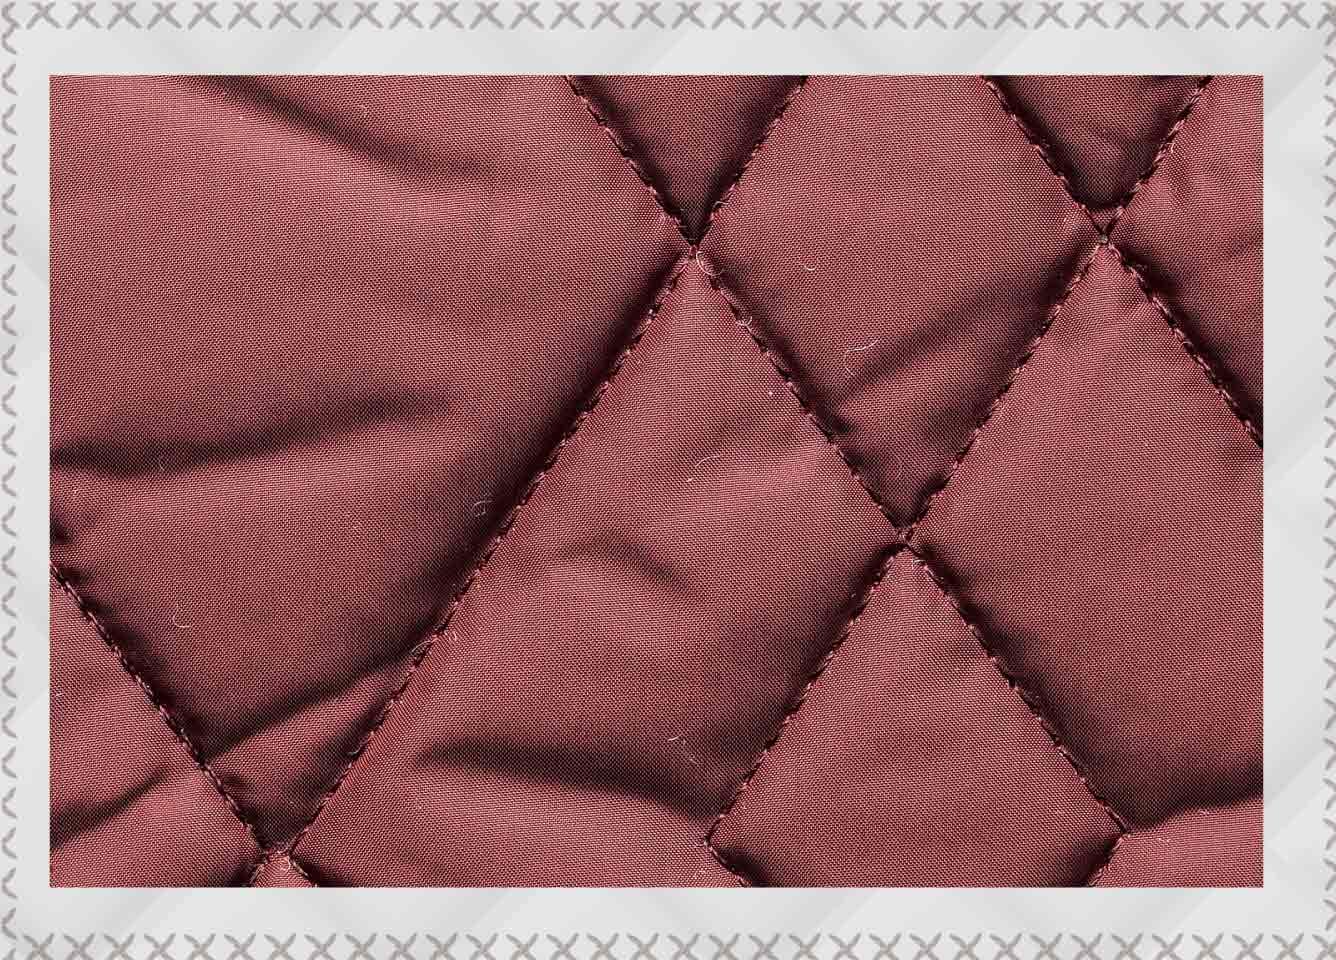 elka-kapitone-giyim-tekstil-sektoru-as0014